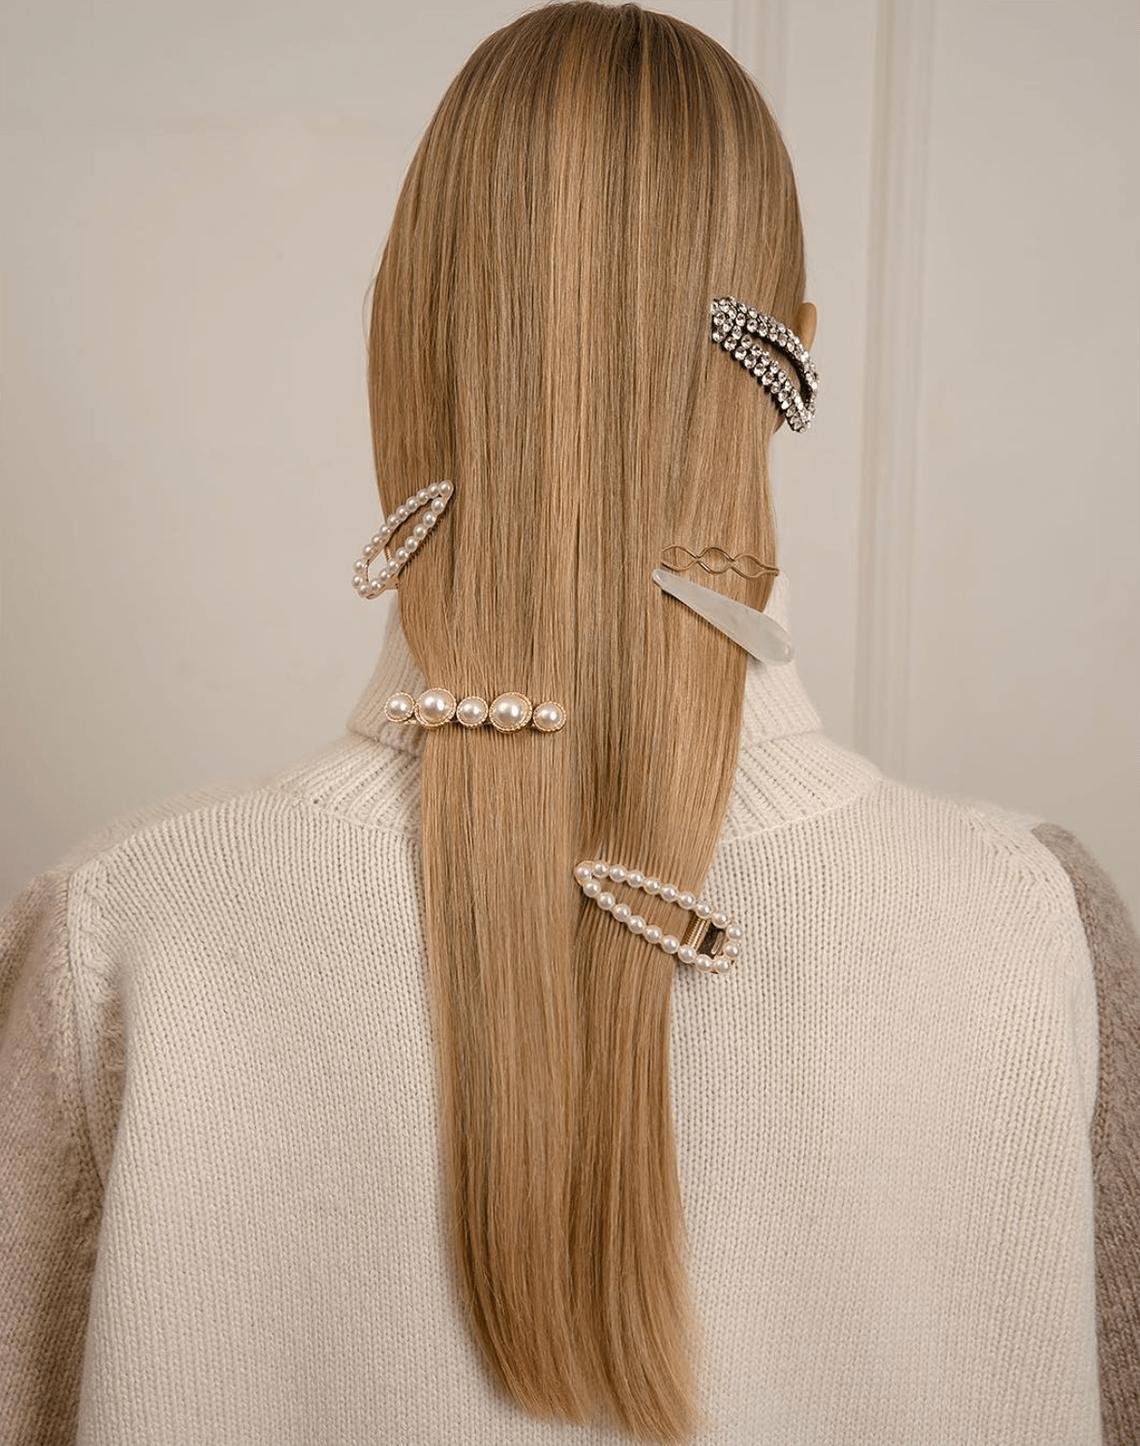 Trend: Hair Accessories